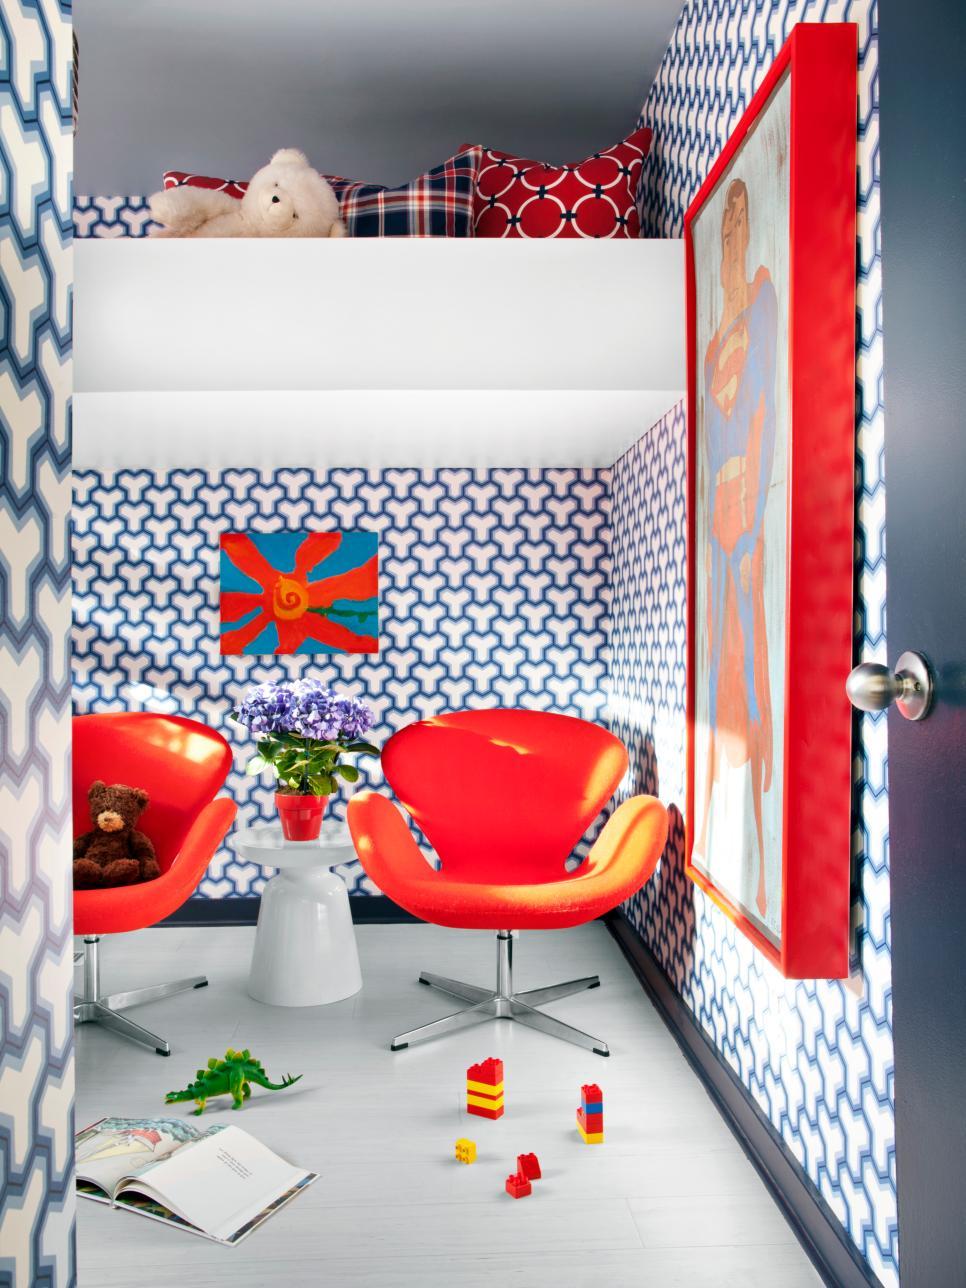 amazing kids bedroom decorating ideas | Decorating Ideas for Fun Playrooms and Kids' Bedrooms | DIY